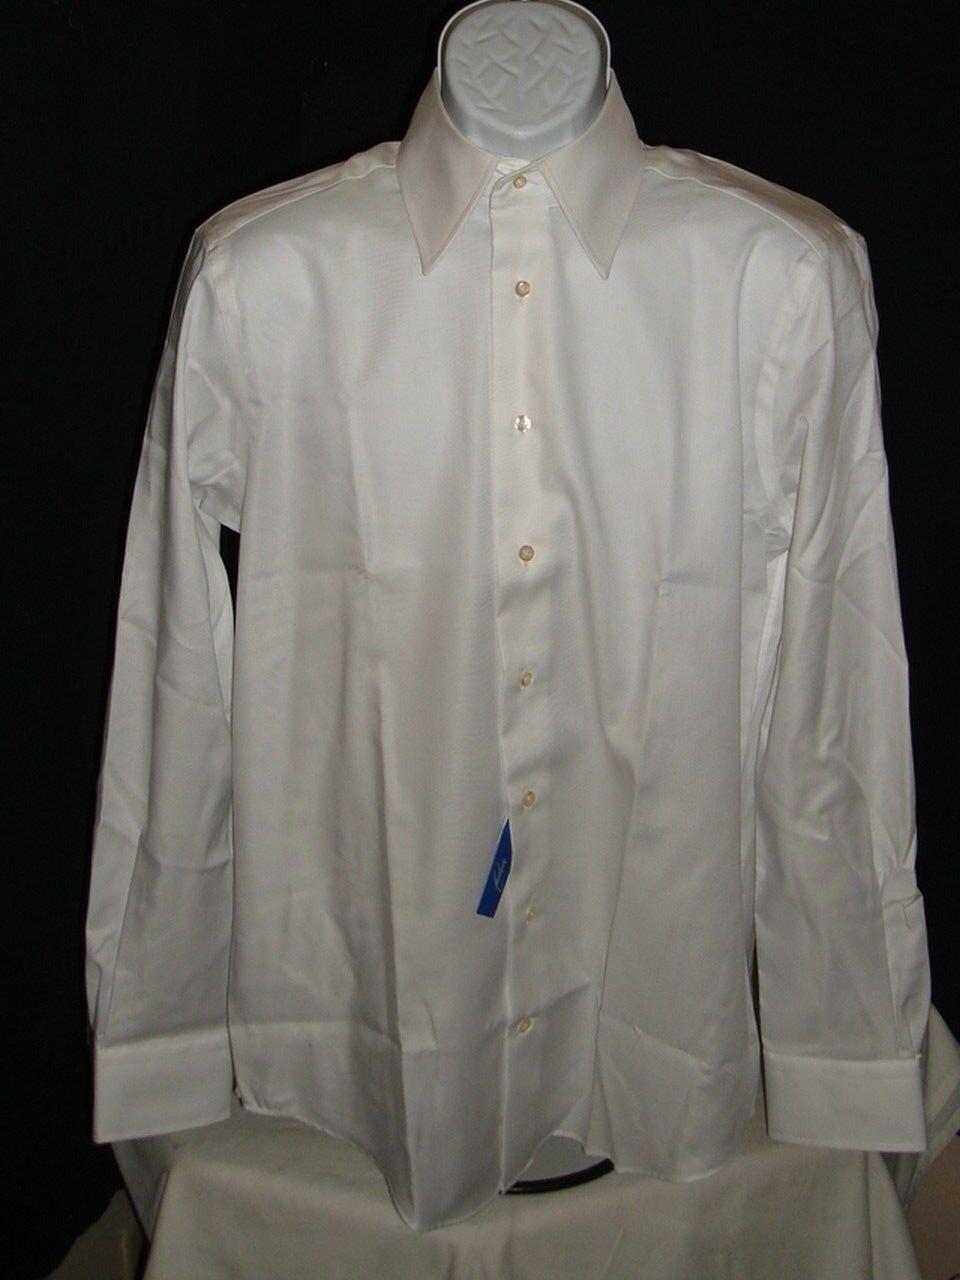 NWT ANDREW J AZZURRO WHITE 100% COTTON DRESS SHIRT SZ. 15 3 4 33-34 SLIM TURKEY